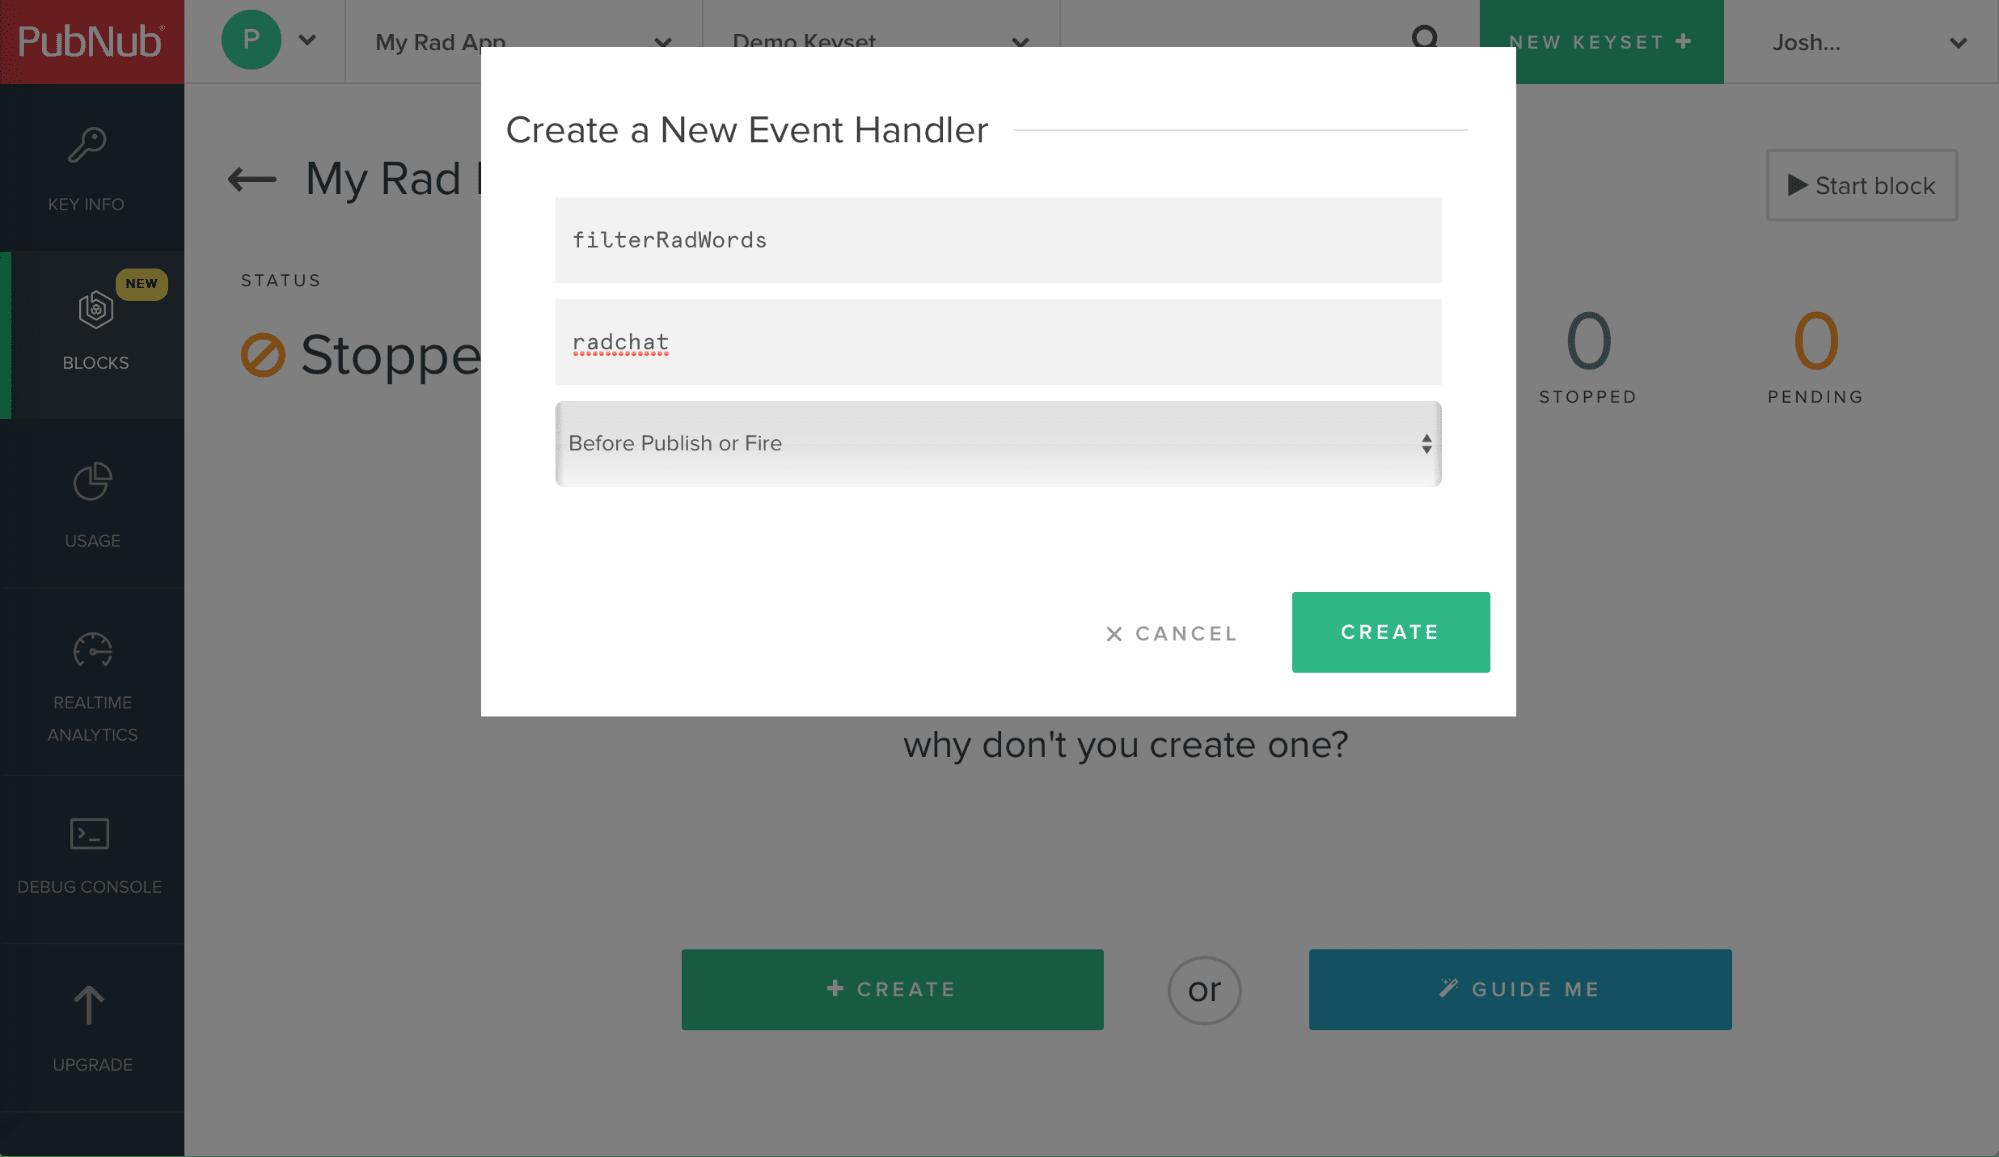 Create Event Handler